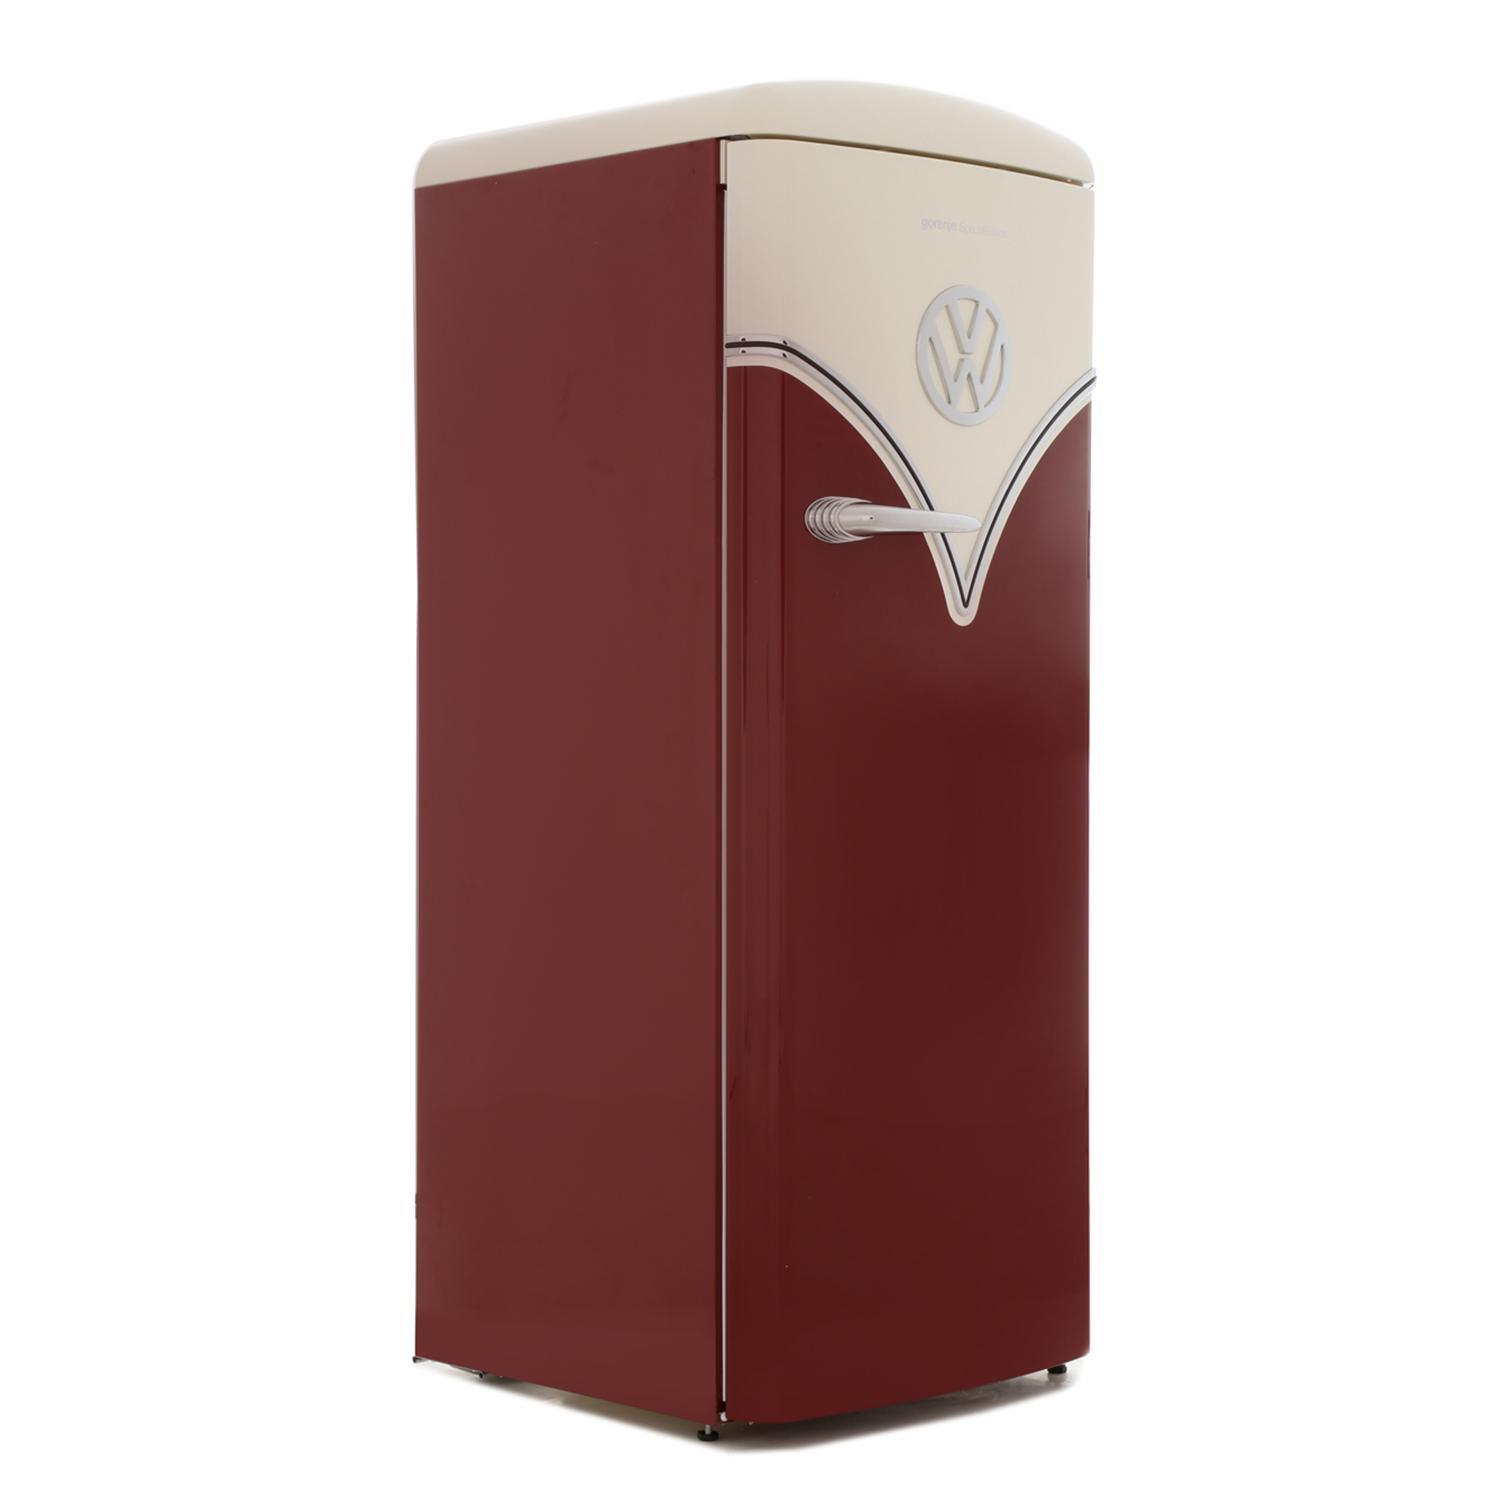 Gorenje OBRB153R Retro Special Edition Tall Fridge with Ice Box